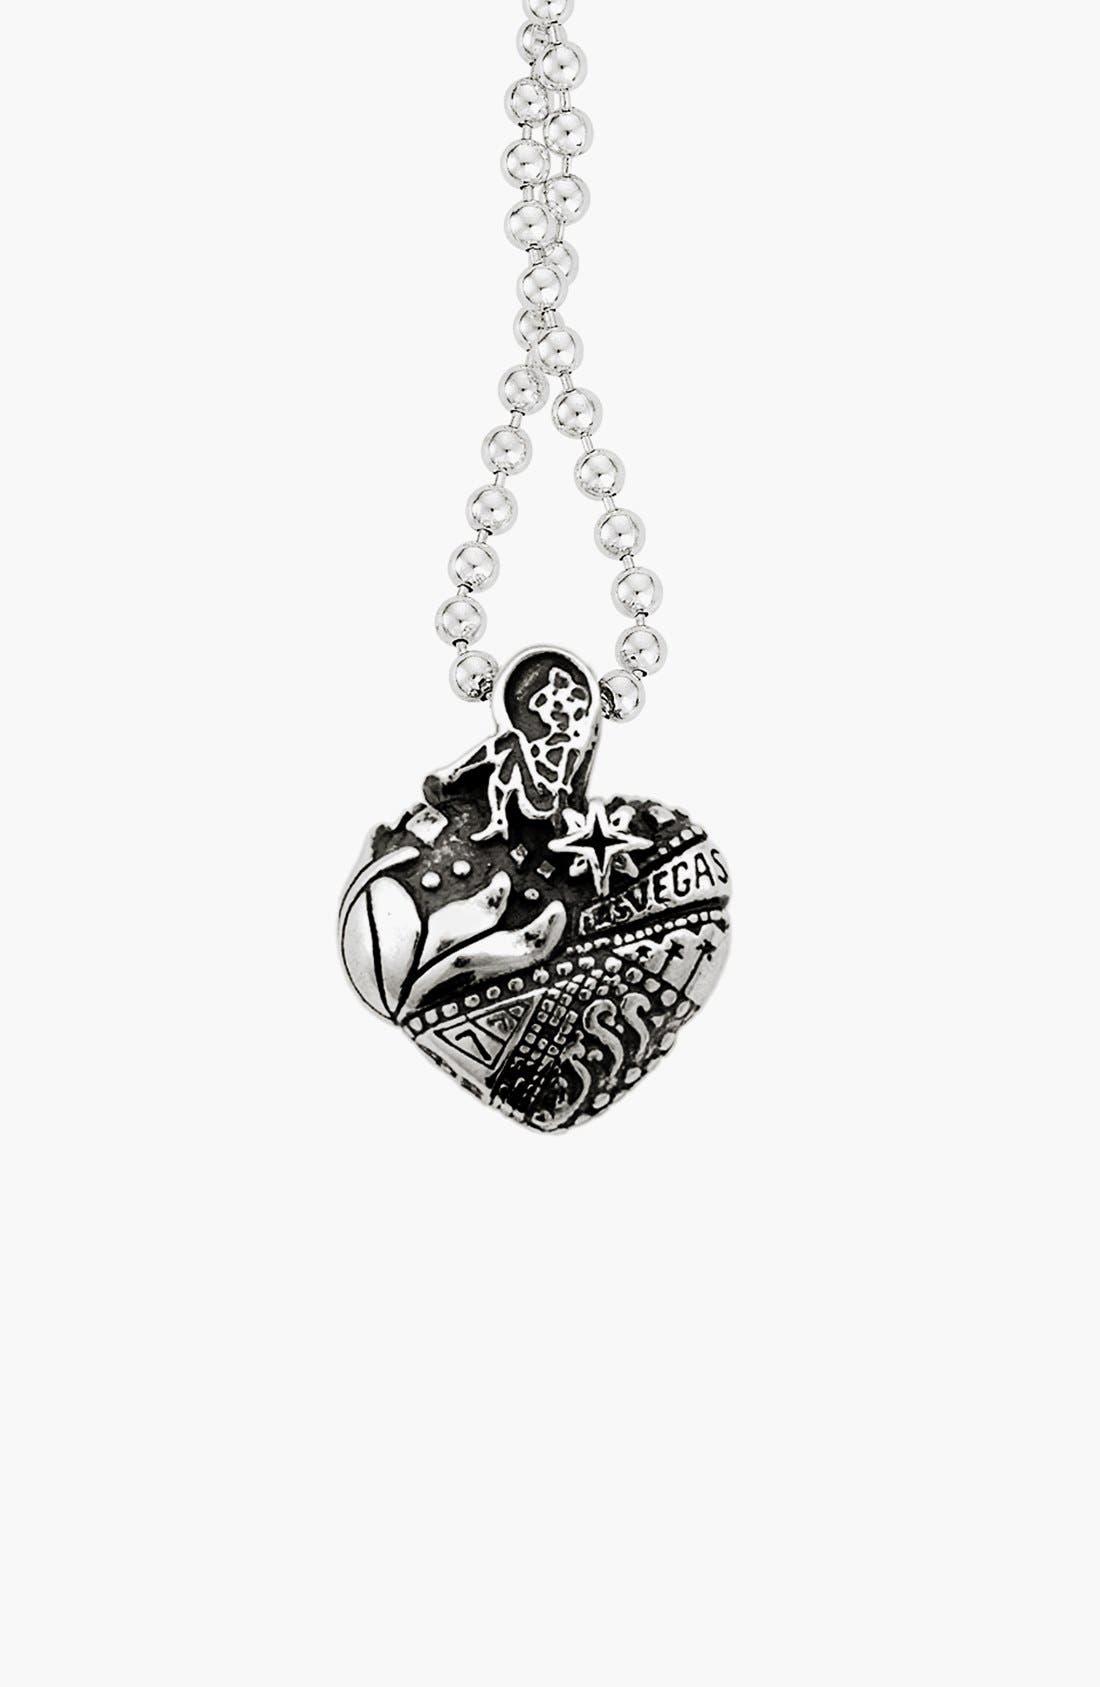 'Hearts of LAGOS - Las Vegas' Reversible Pendant Necklace,                             Alternate thumbnail 3, color,                             Heart Of Las Vegas